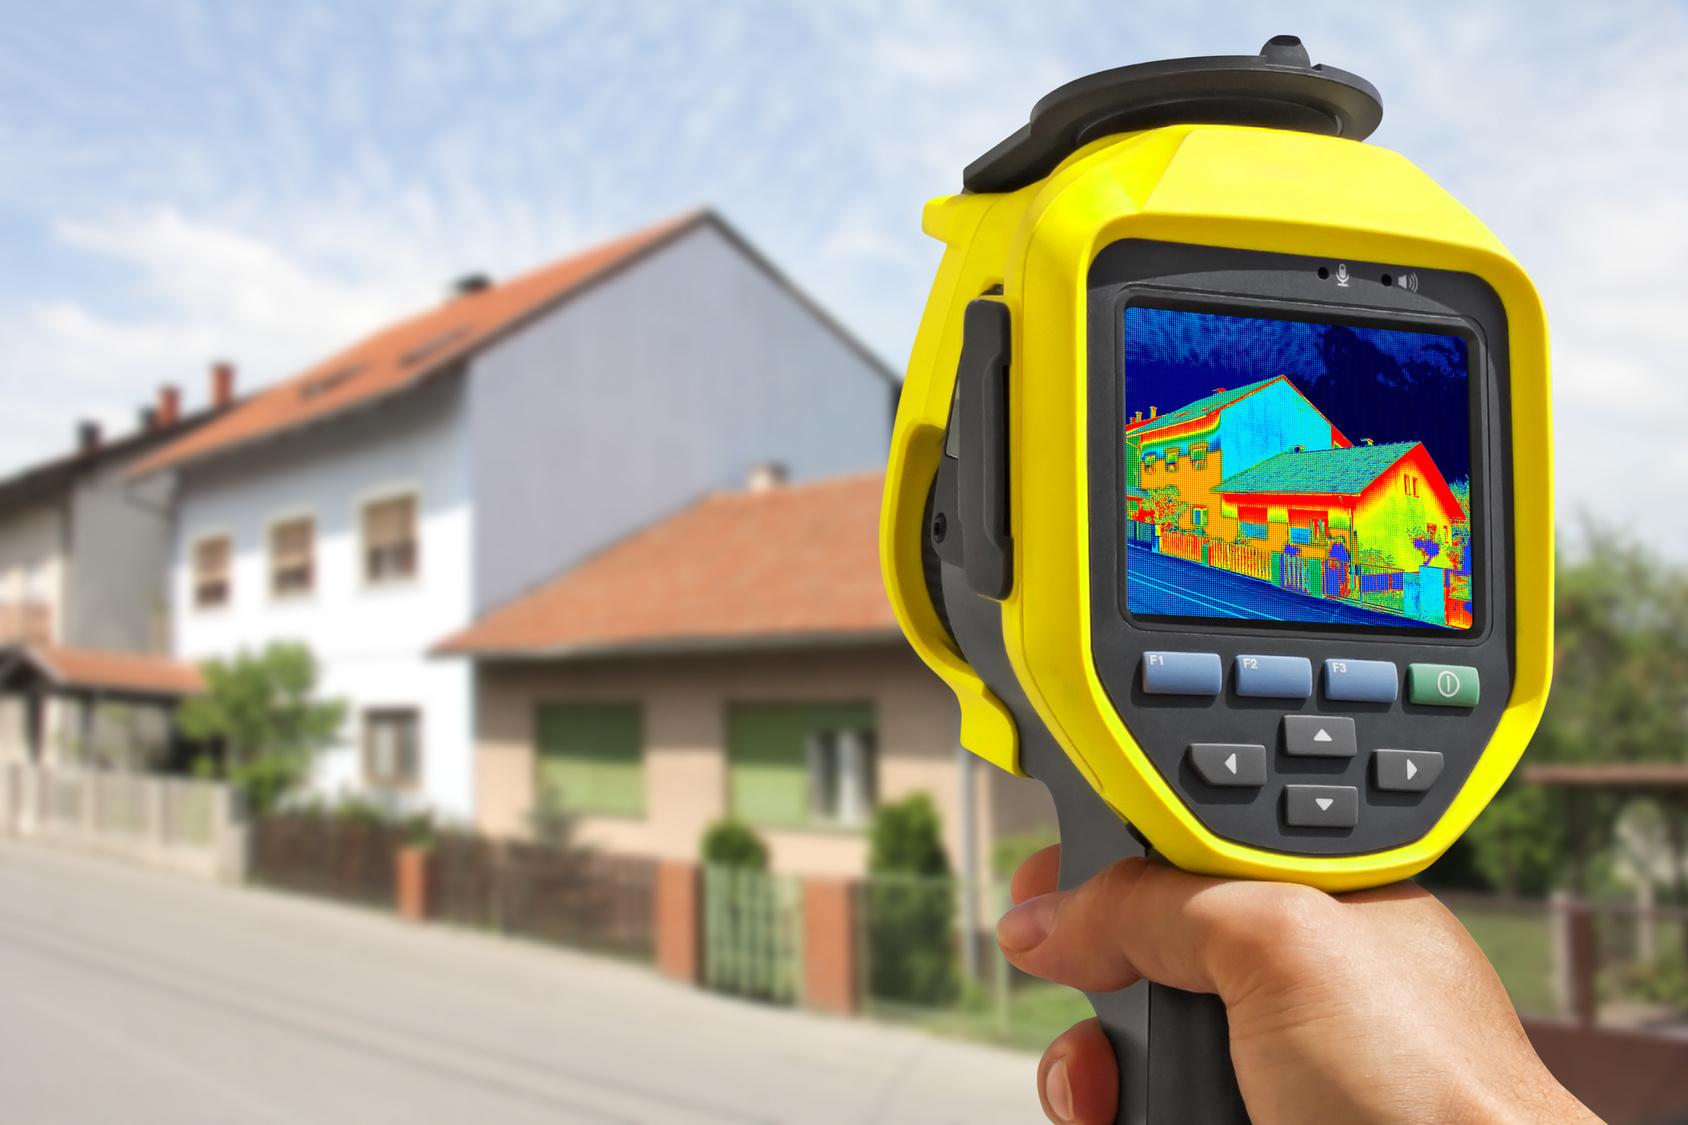 Обследование и проверка дома тепловизором при покупке или контроле